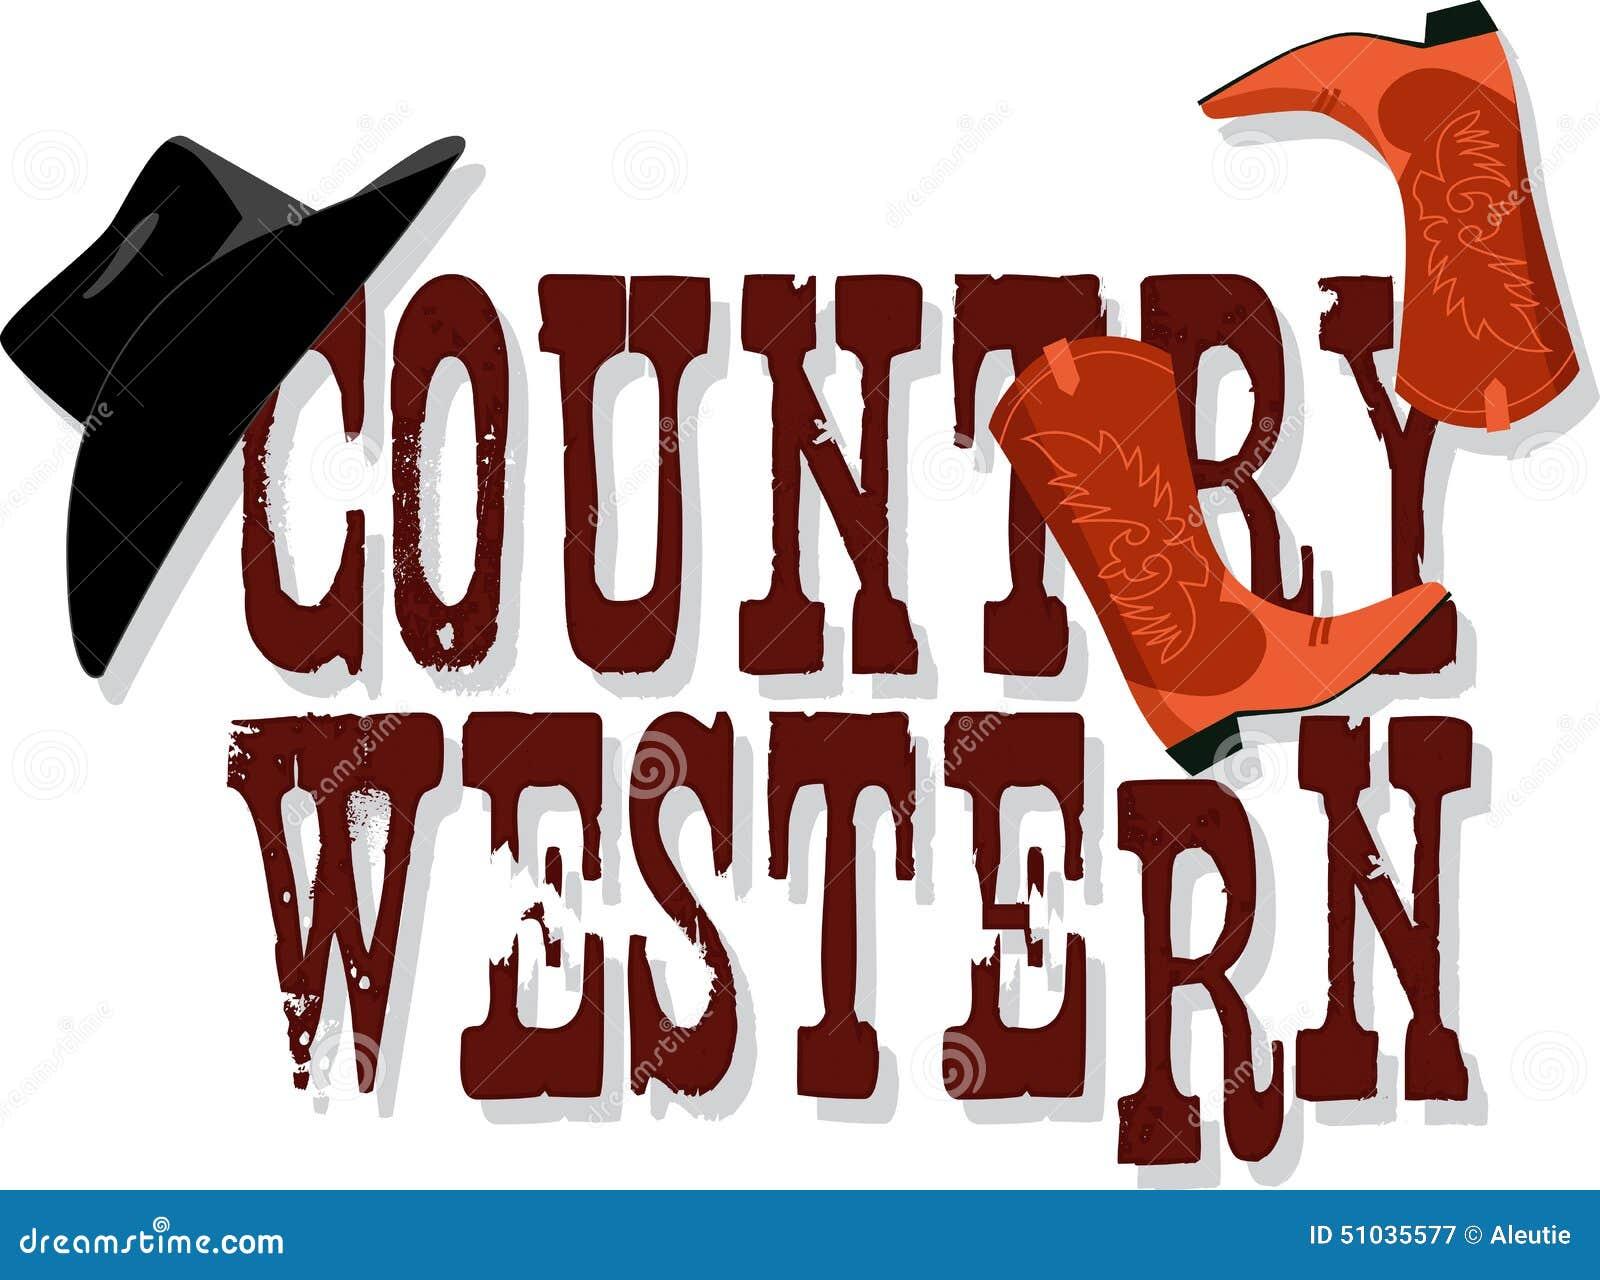 ... hat and cowboy boots, vector illustration, no transparencies, EPS 8